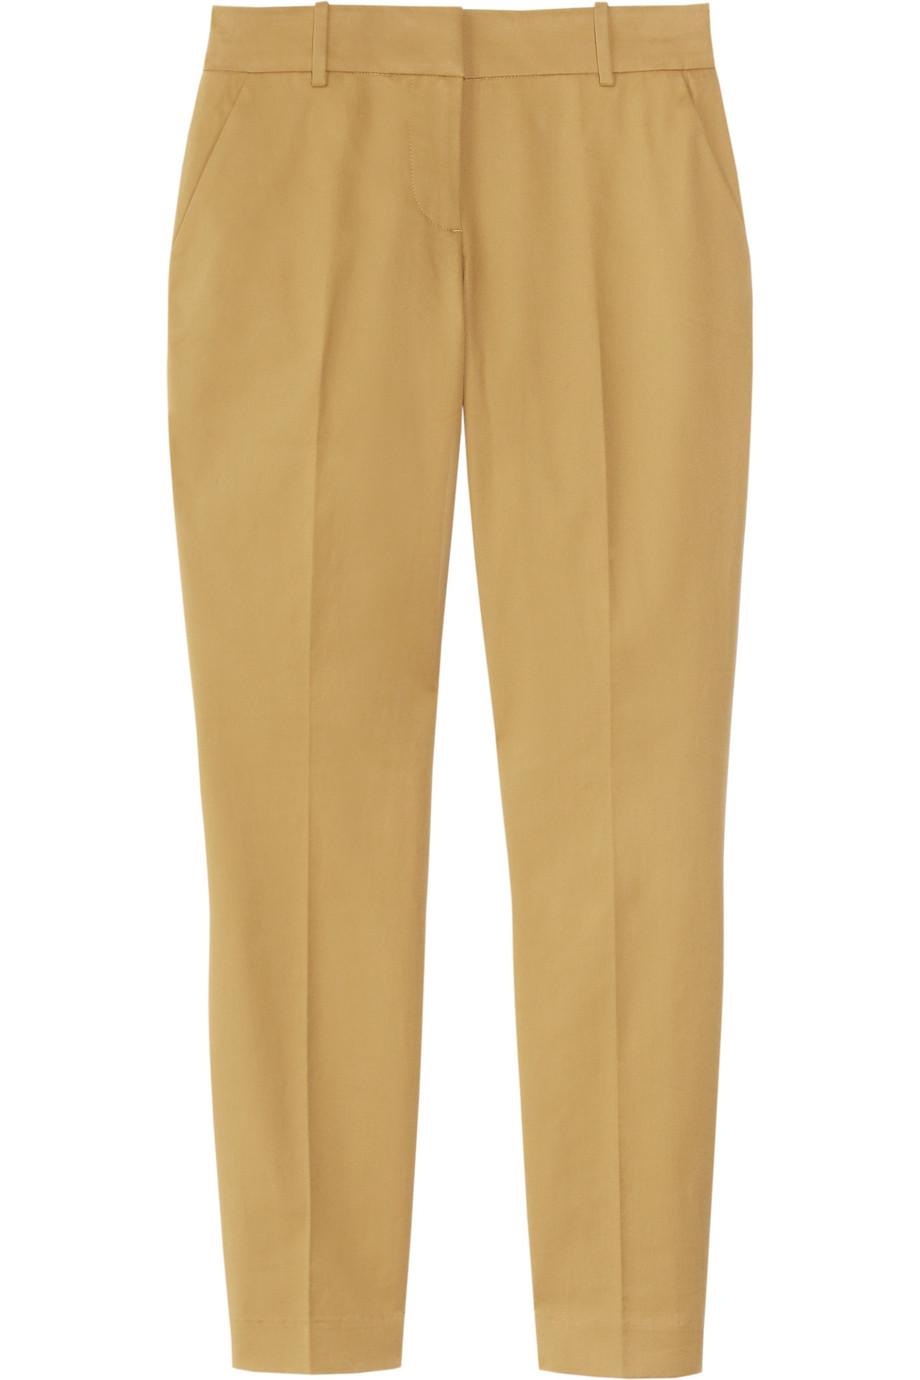 Original Regatta Womens/Ladies Maleena Coolweave Cotton Capri Pants Trousers - Regatta Trousers U0026 Shorts ...